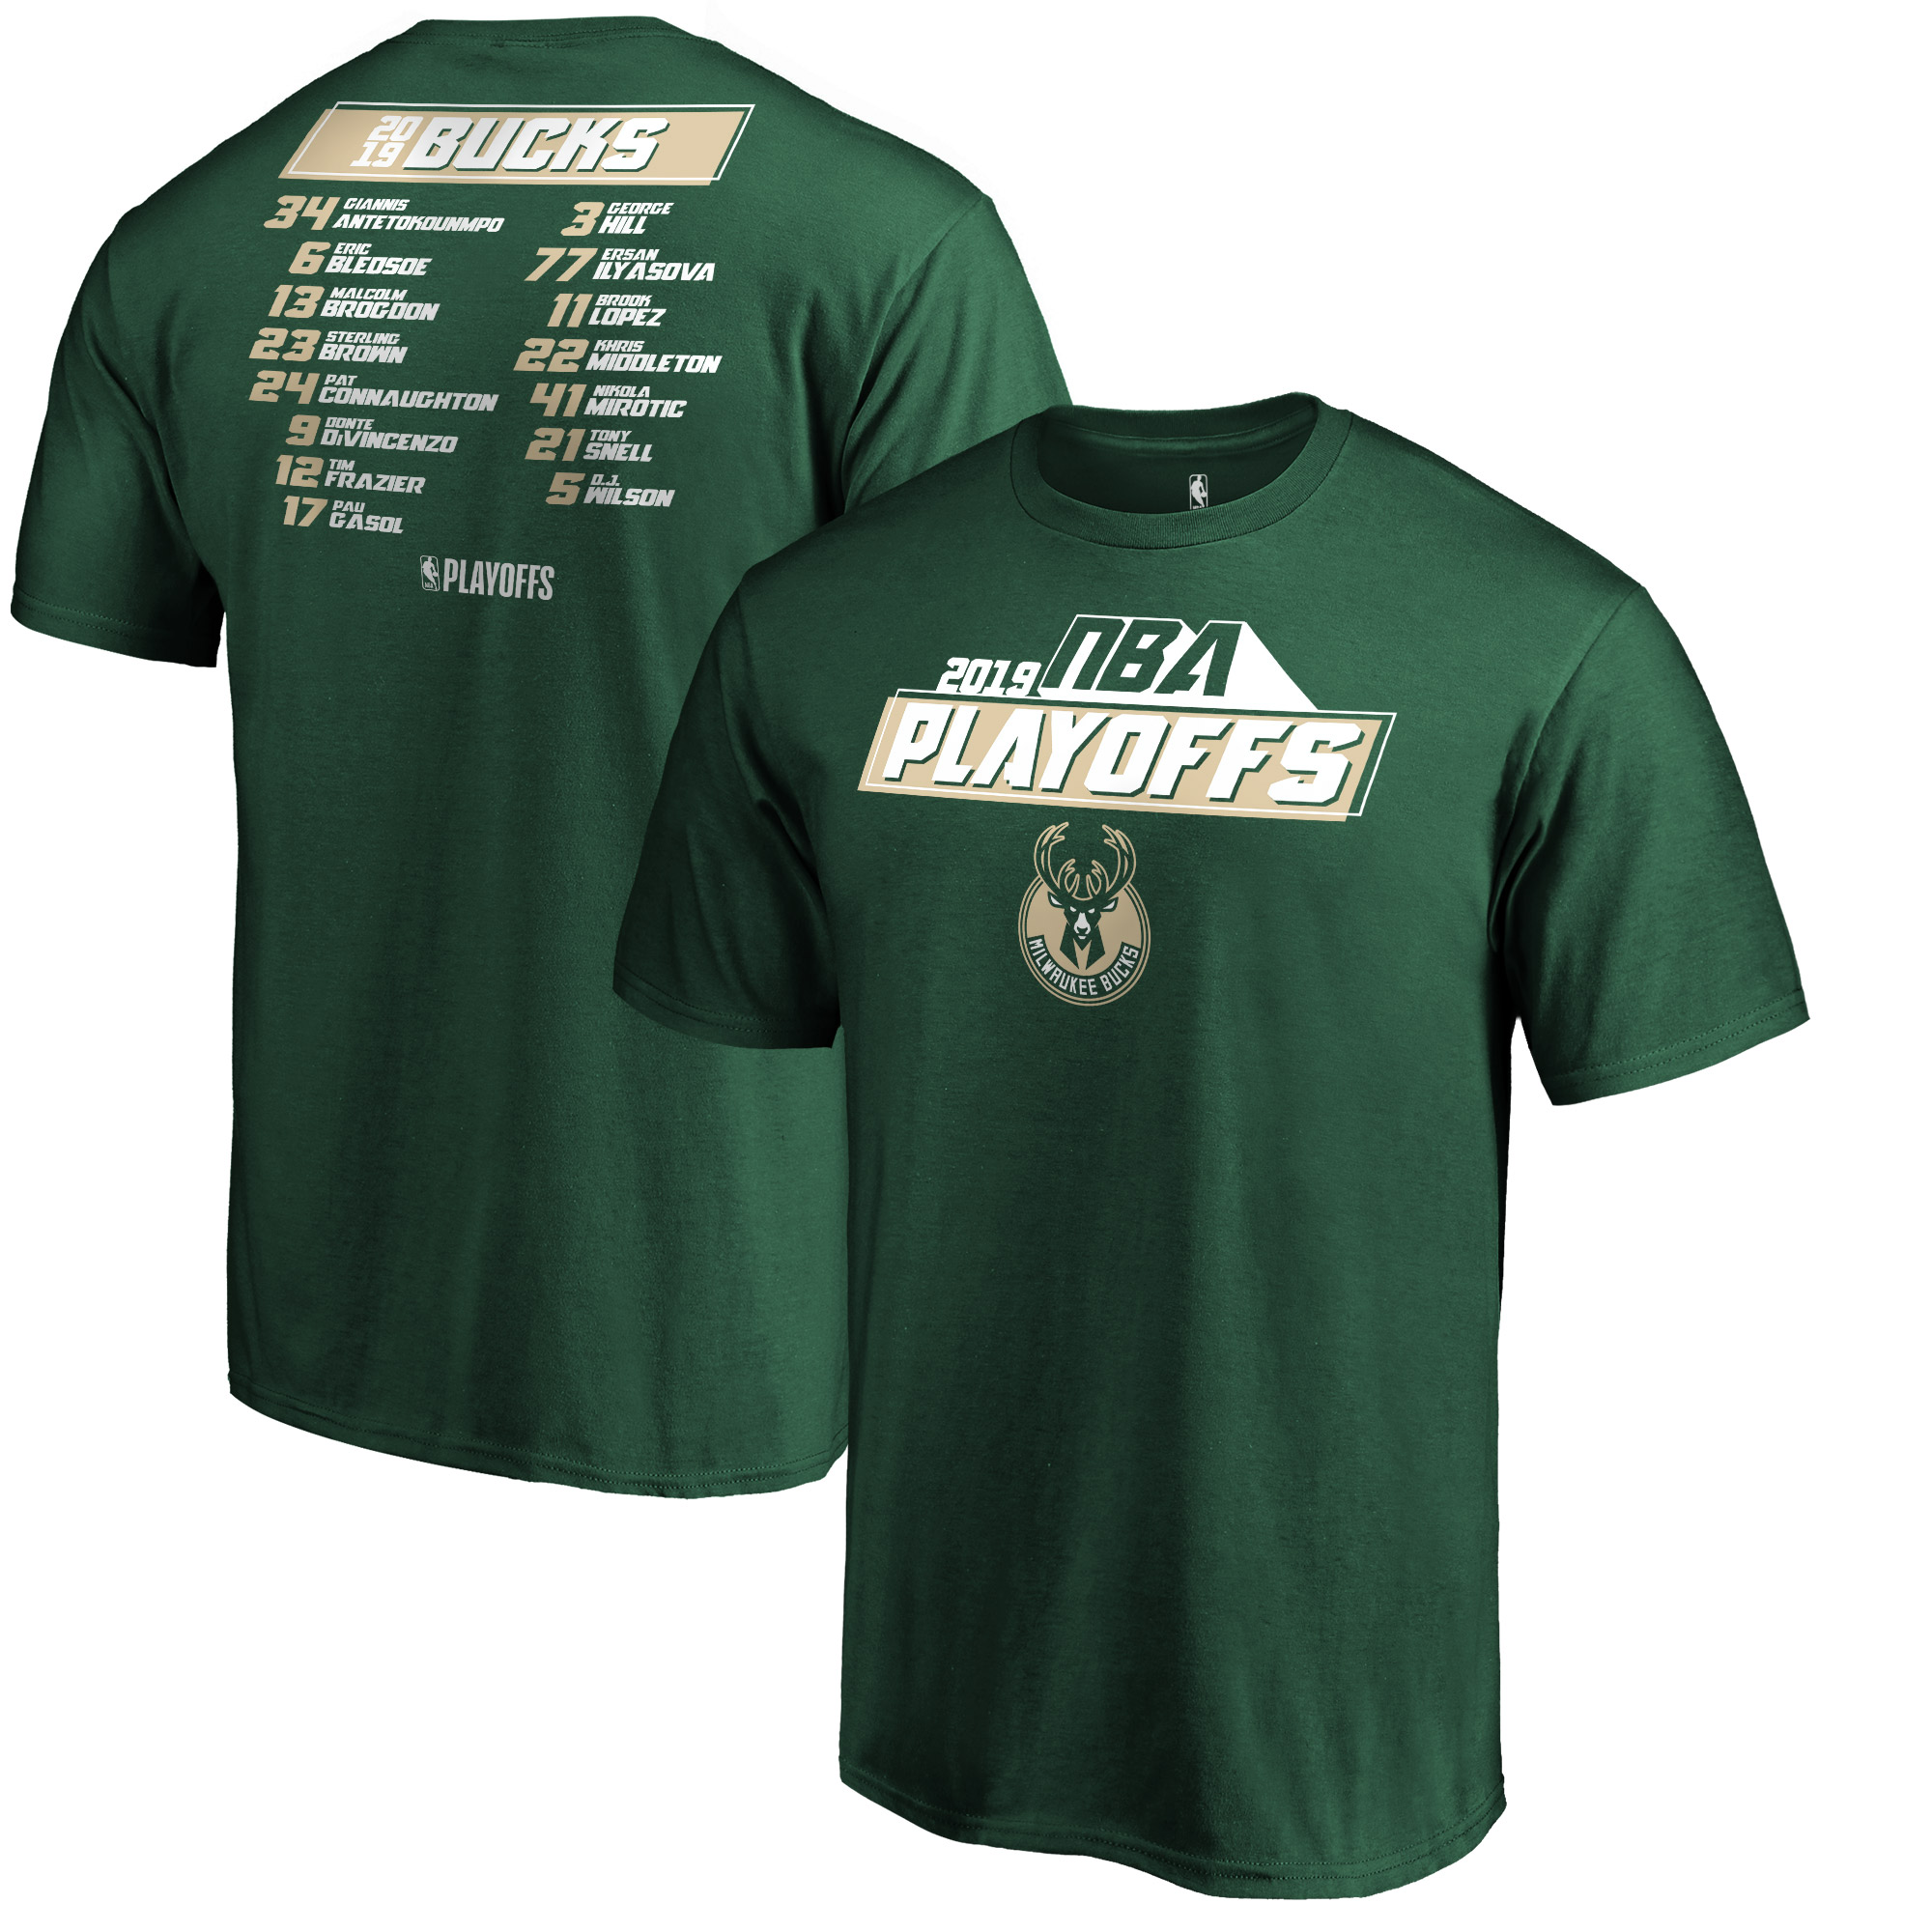 f8ef10dea45 Milwaukee Bucks Team Shop - Walmart.com